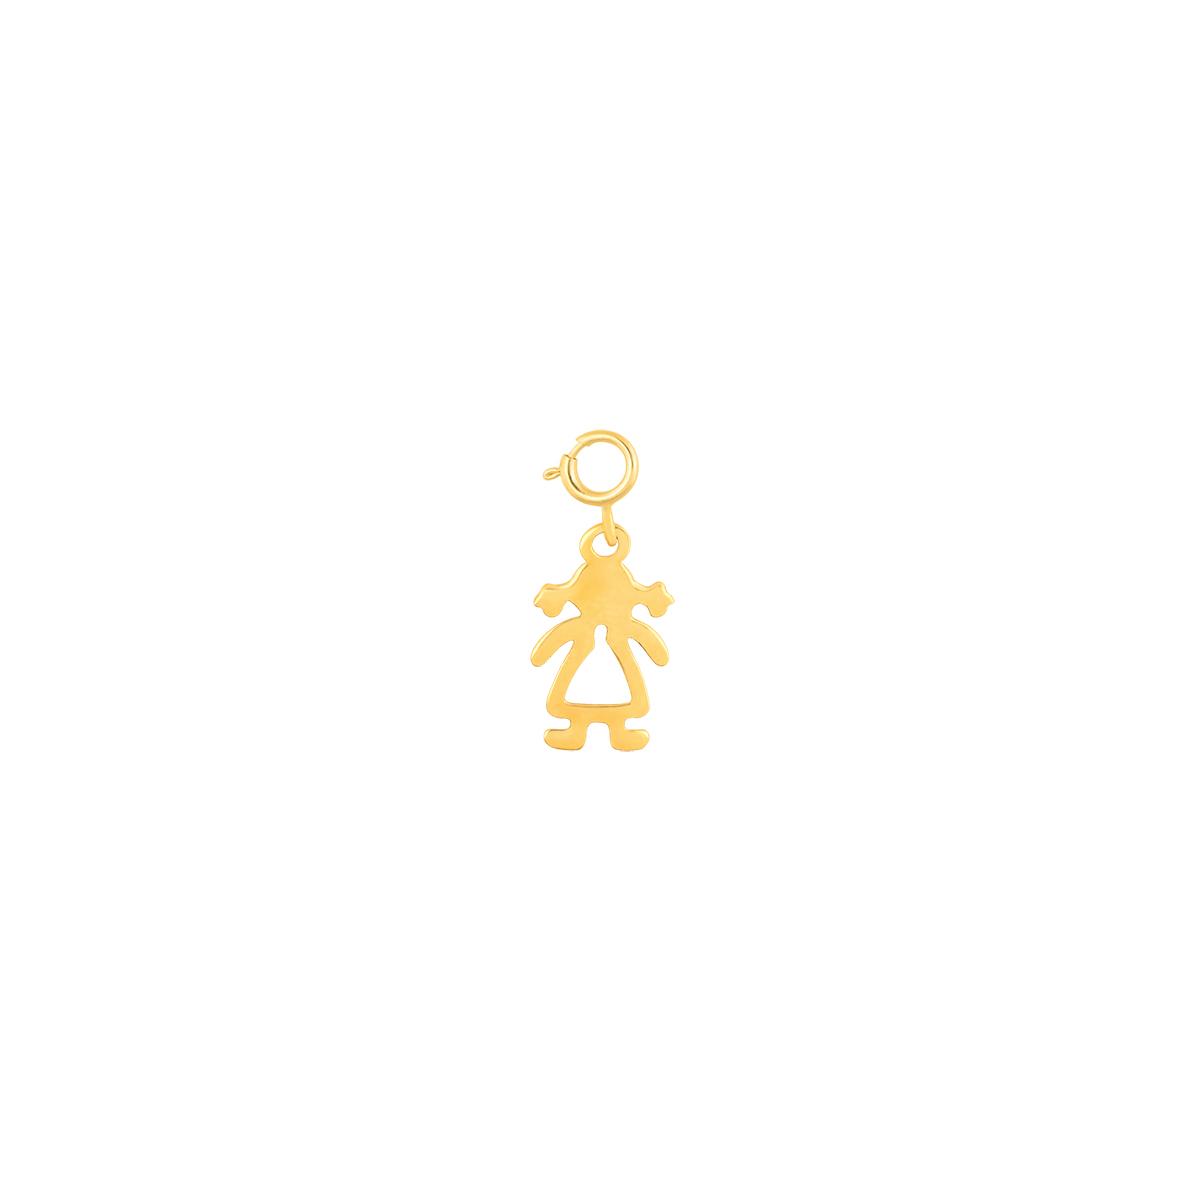 آویز طلا دختر کوچک پرسته